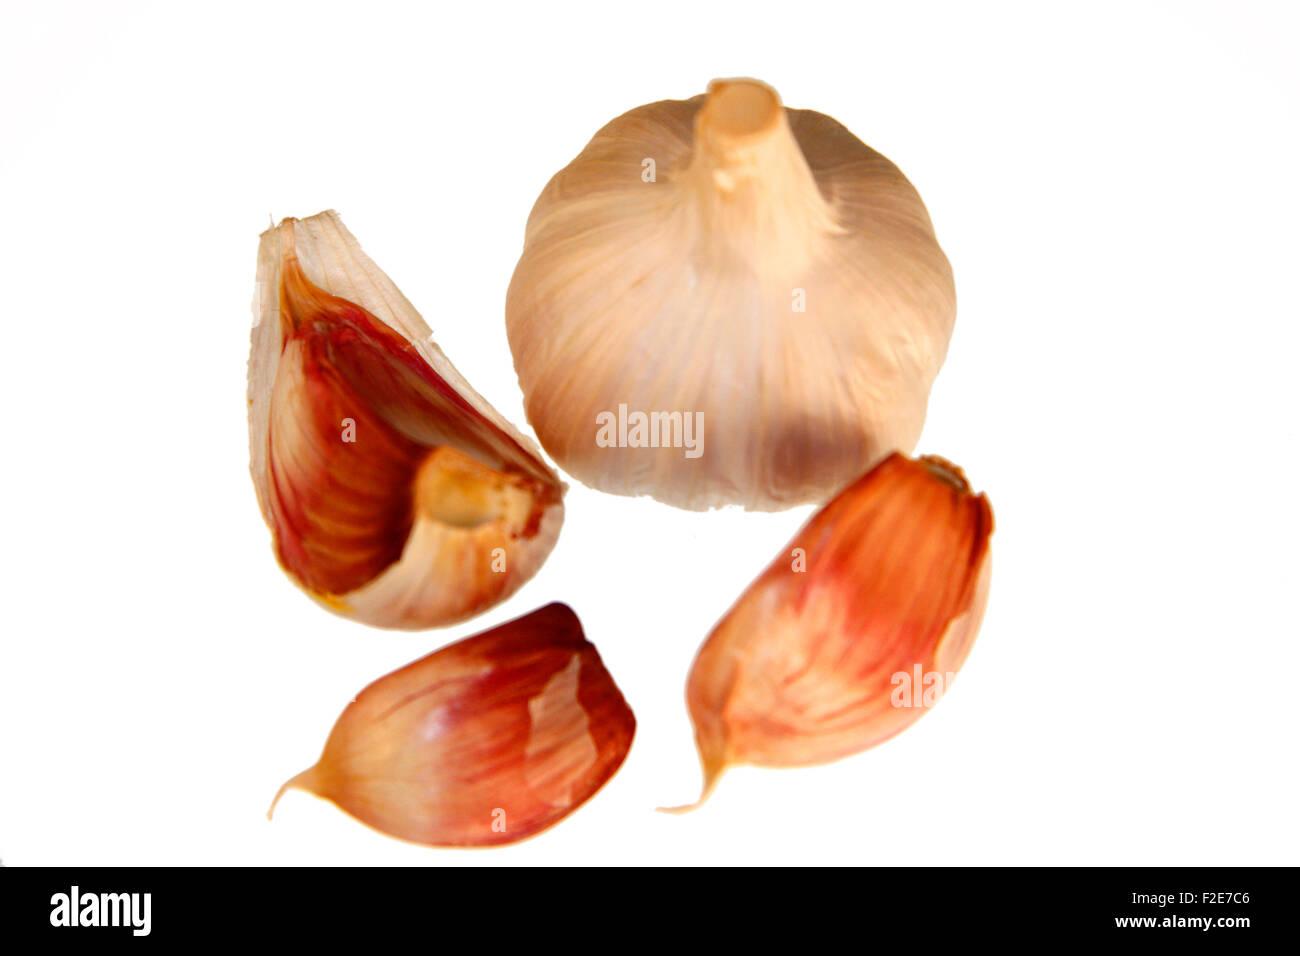 Knoblauch - Symbolbild Nahrungsmittel. Stock Photo